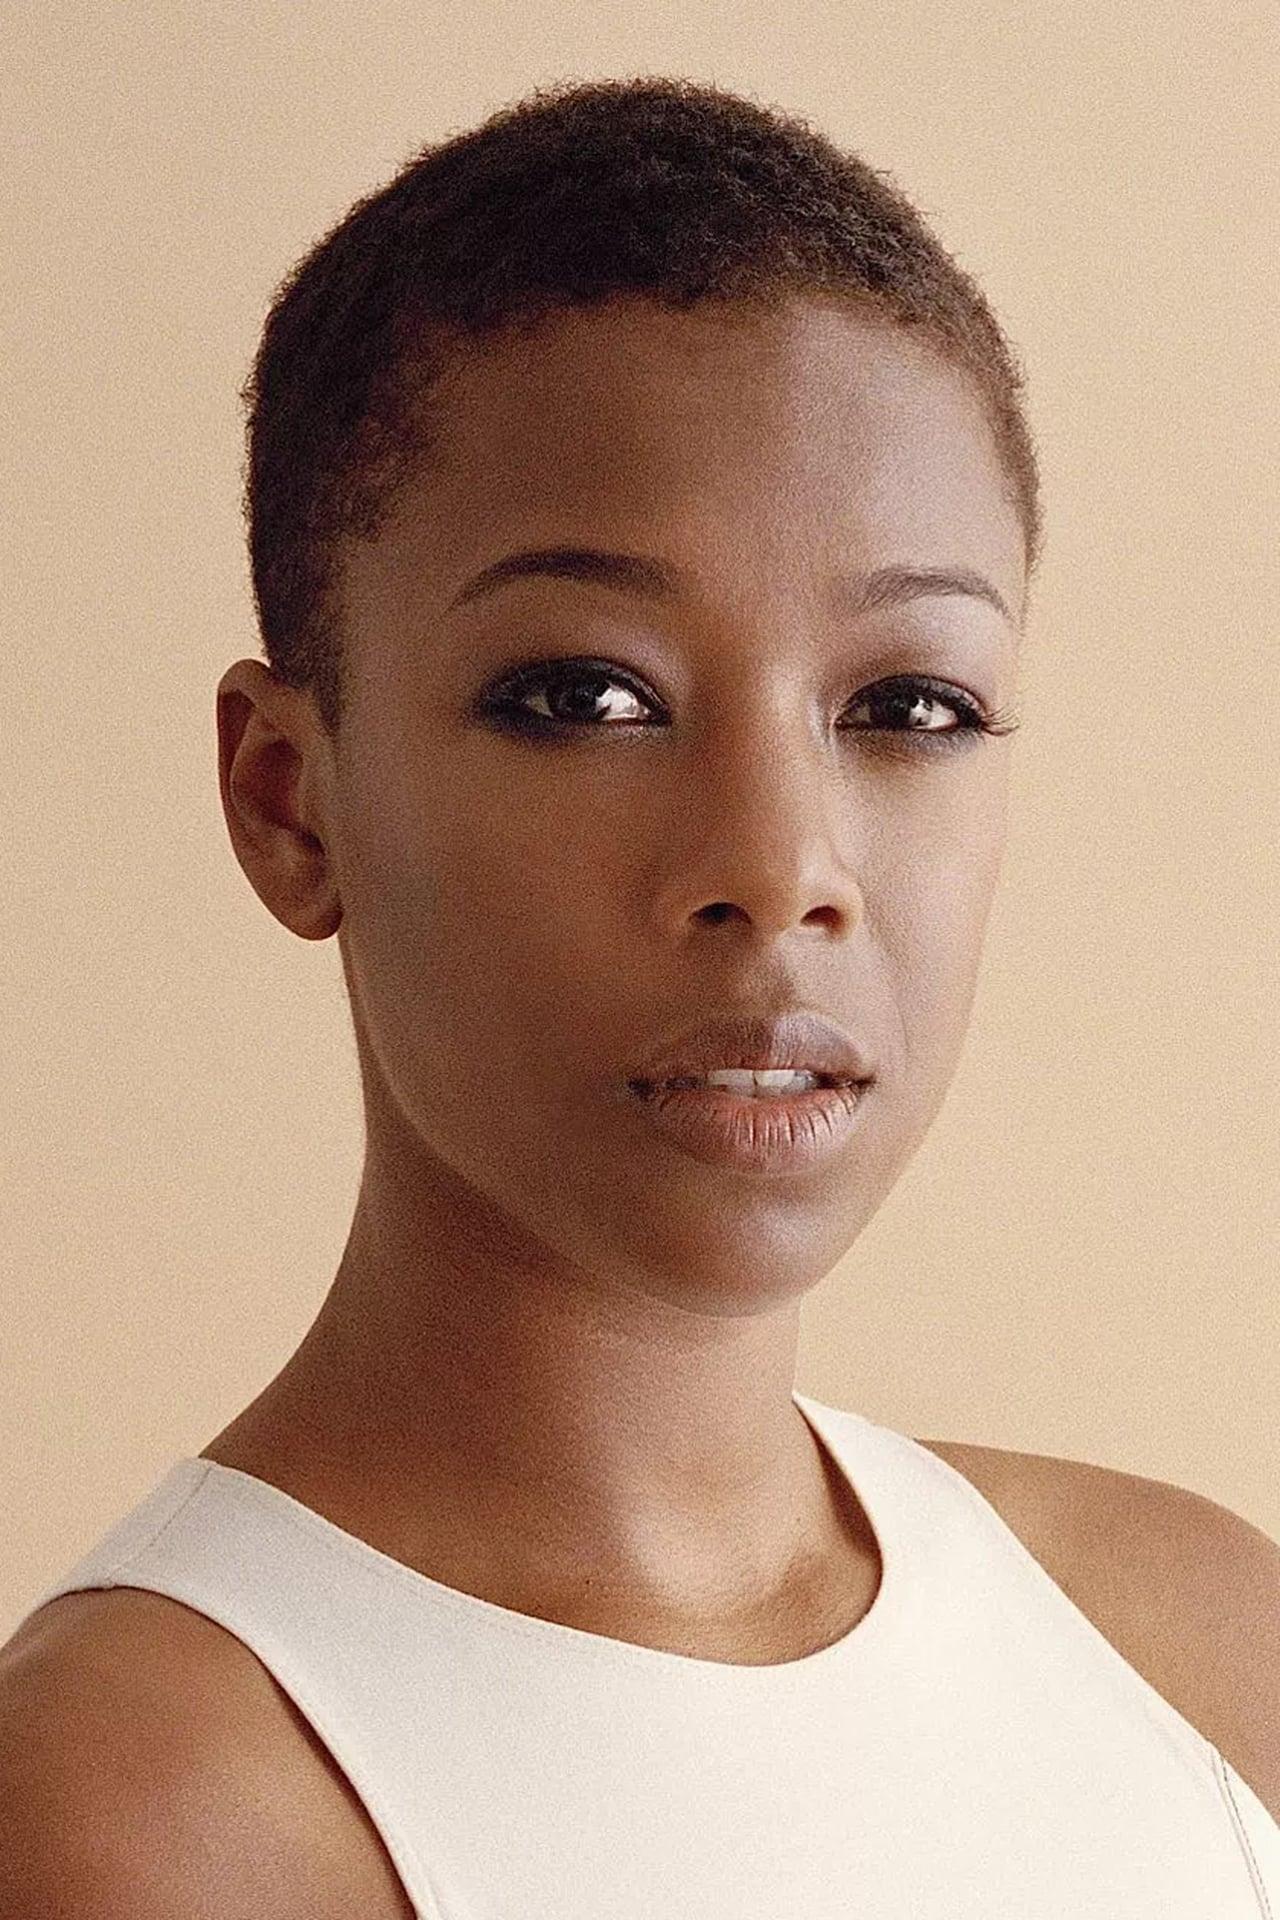 Samira Wiley